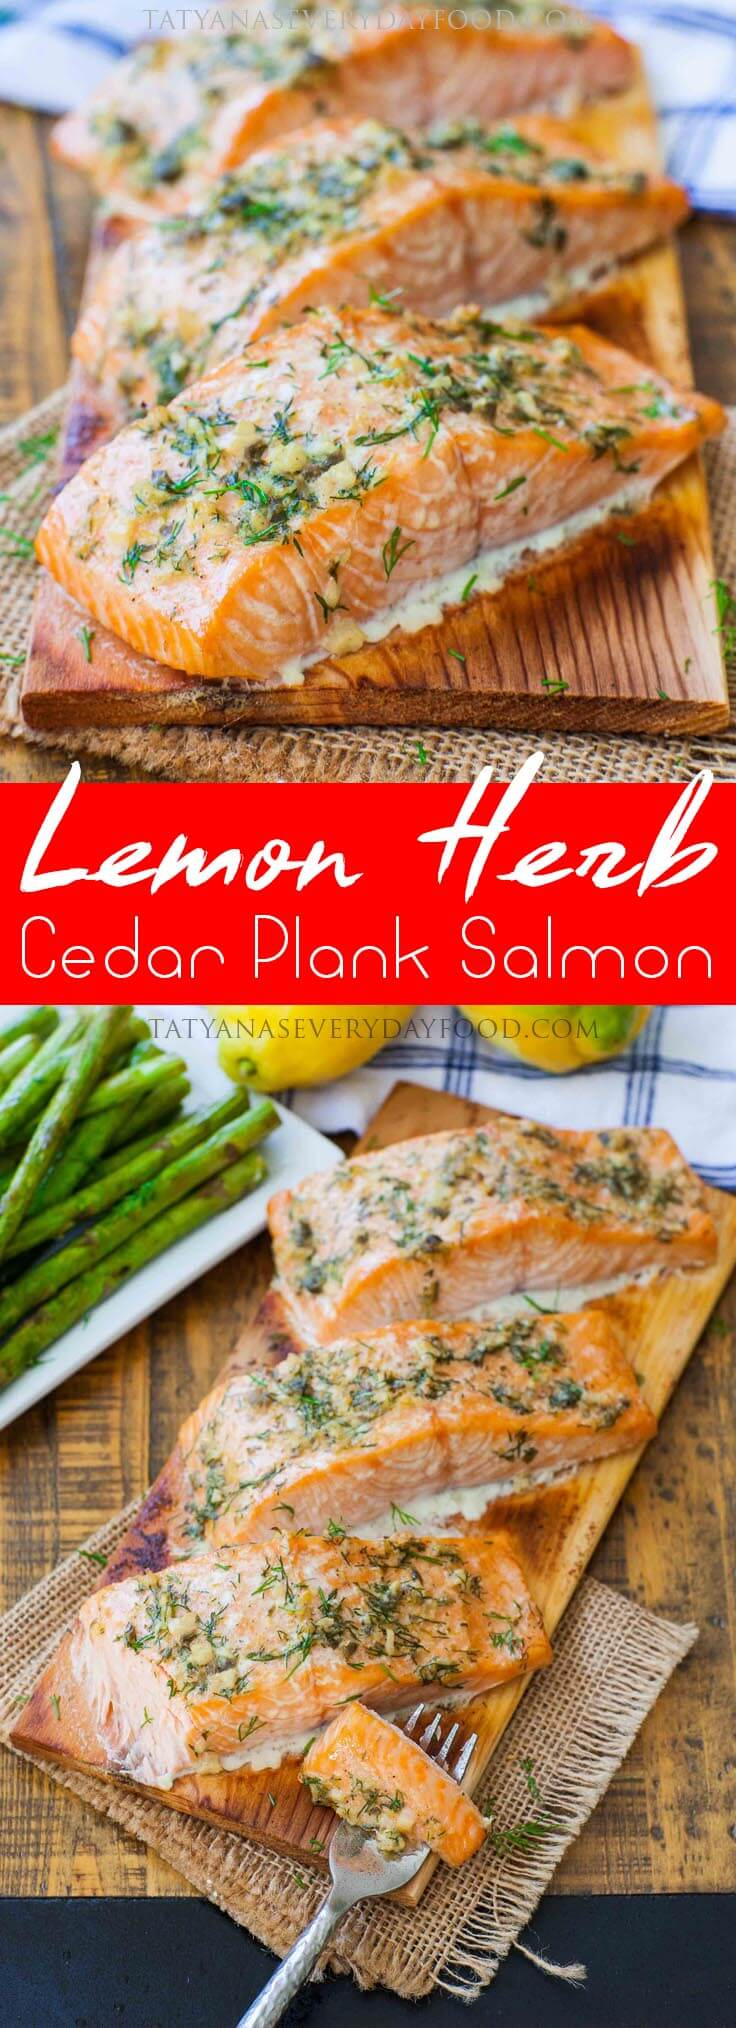 lemon herb salmon pinboard